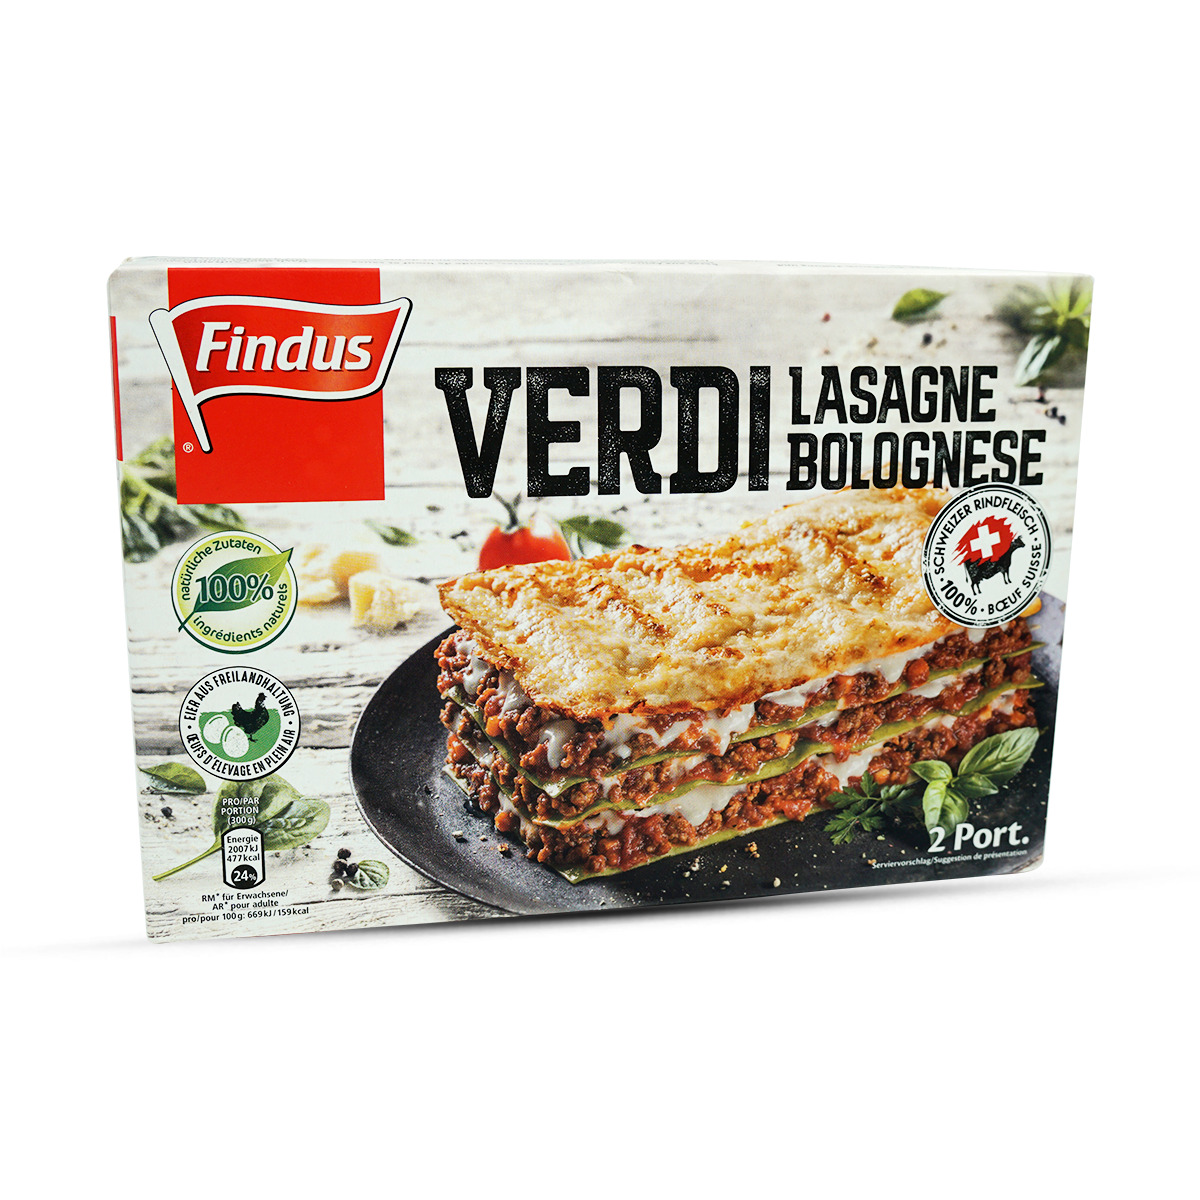 Findus Lasagne Verdi al Forno